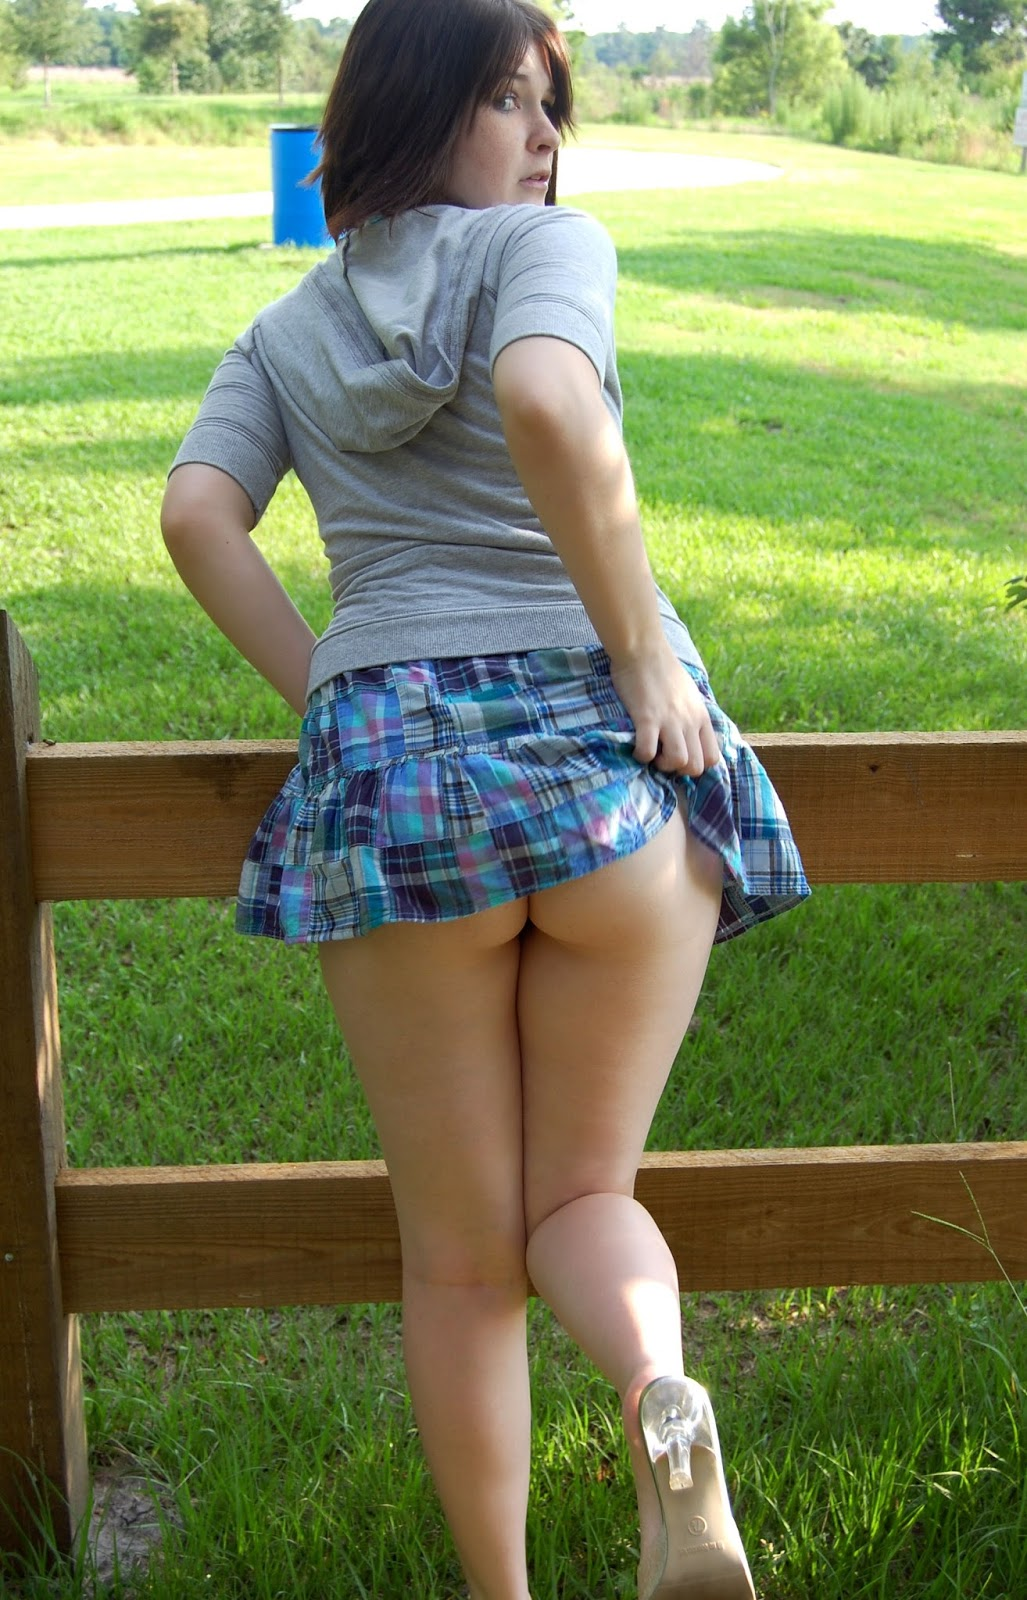 Залез с большими бедрами телки под юбку на видео время